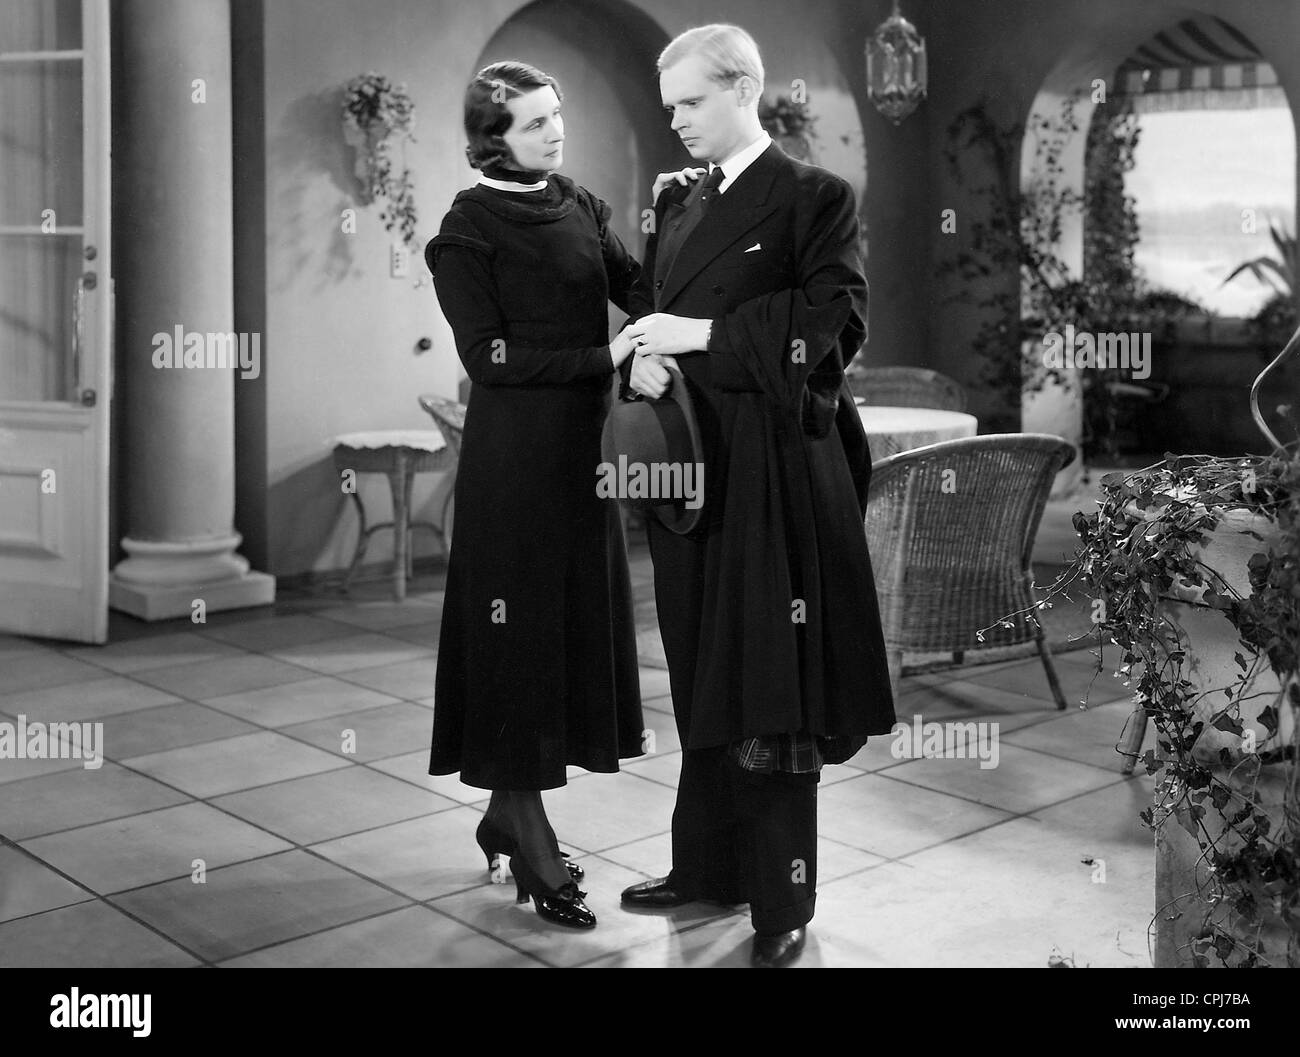 Albert Lieven in a movie scene - Stock Image